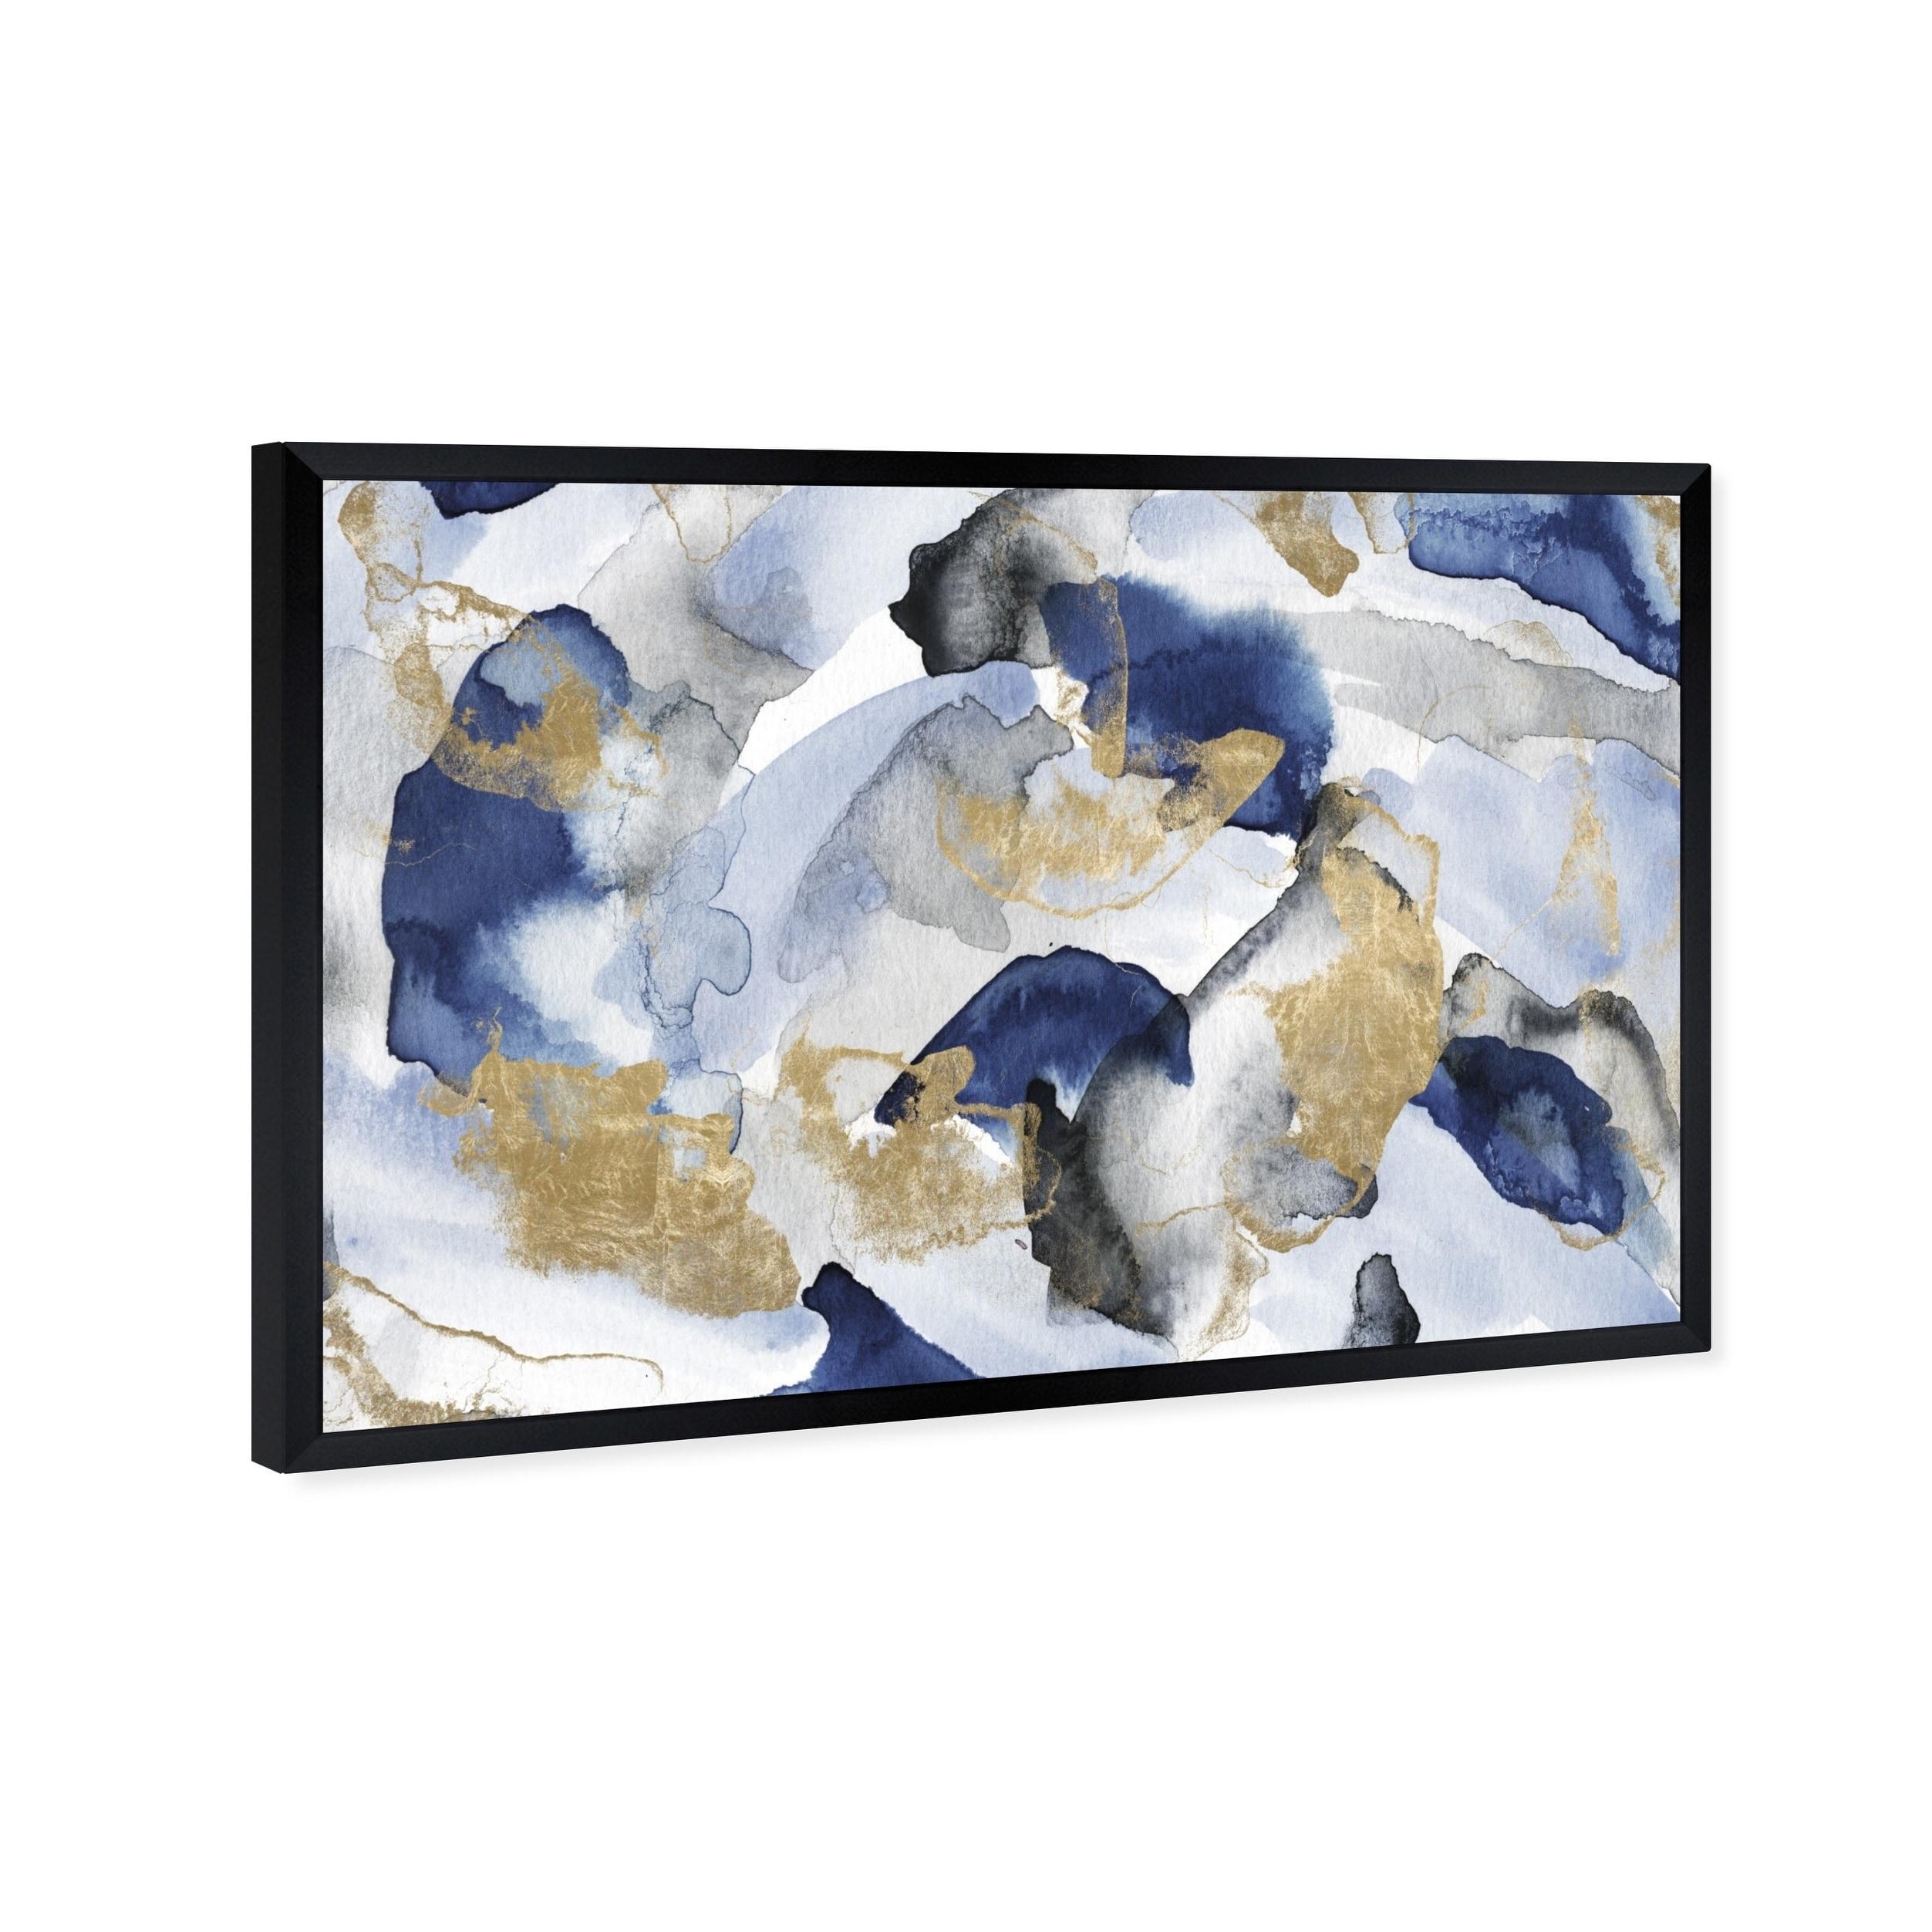 Polar Bear ANIMALS  Canvas Art Print Box Framed Picture Wall Hanging BBD